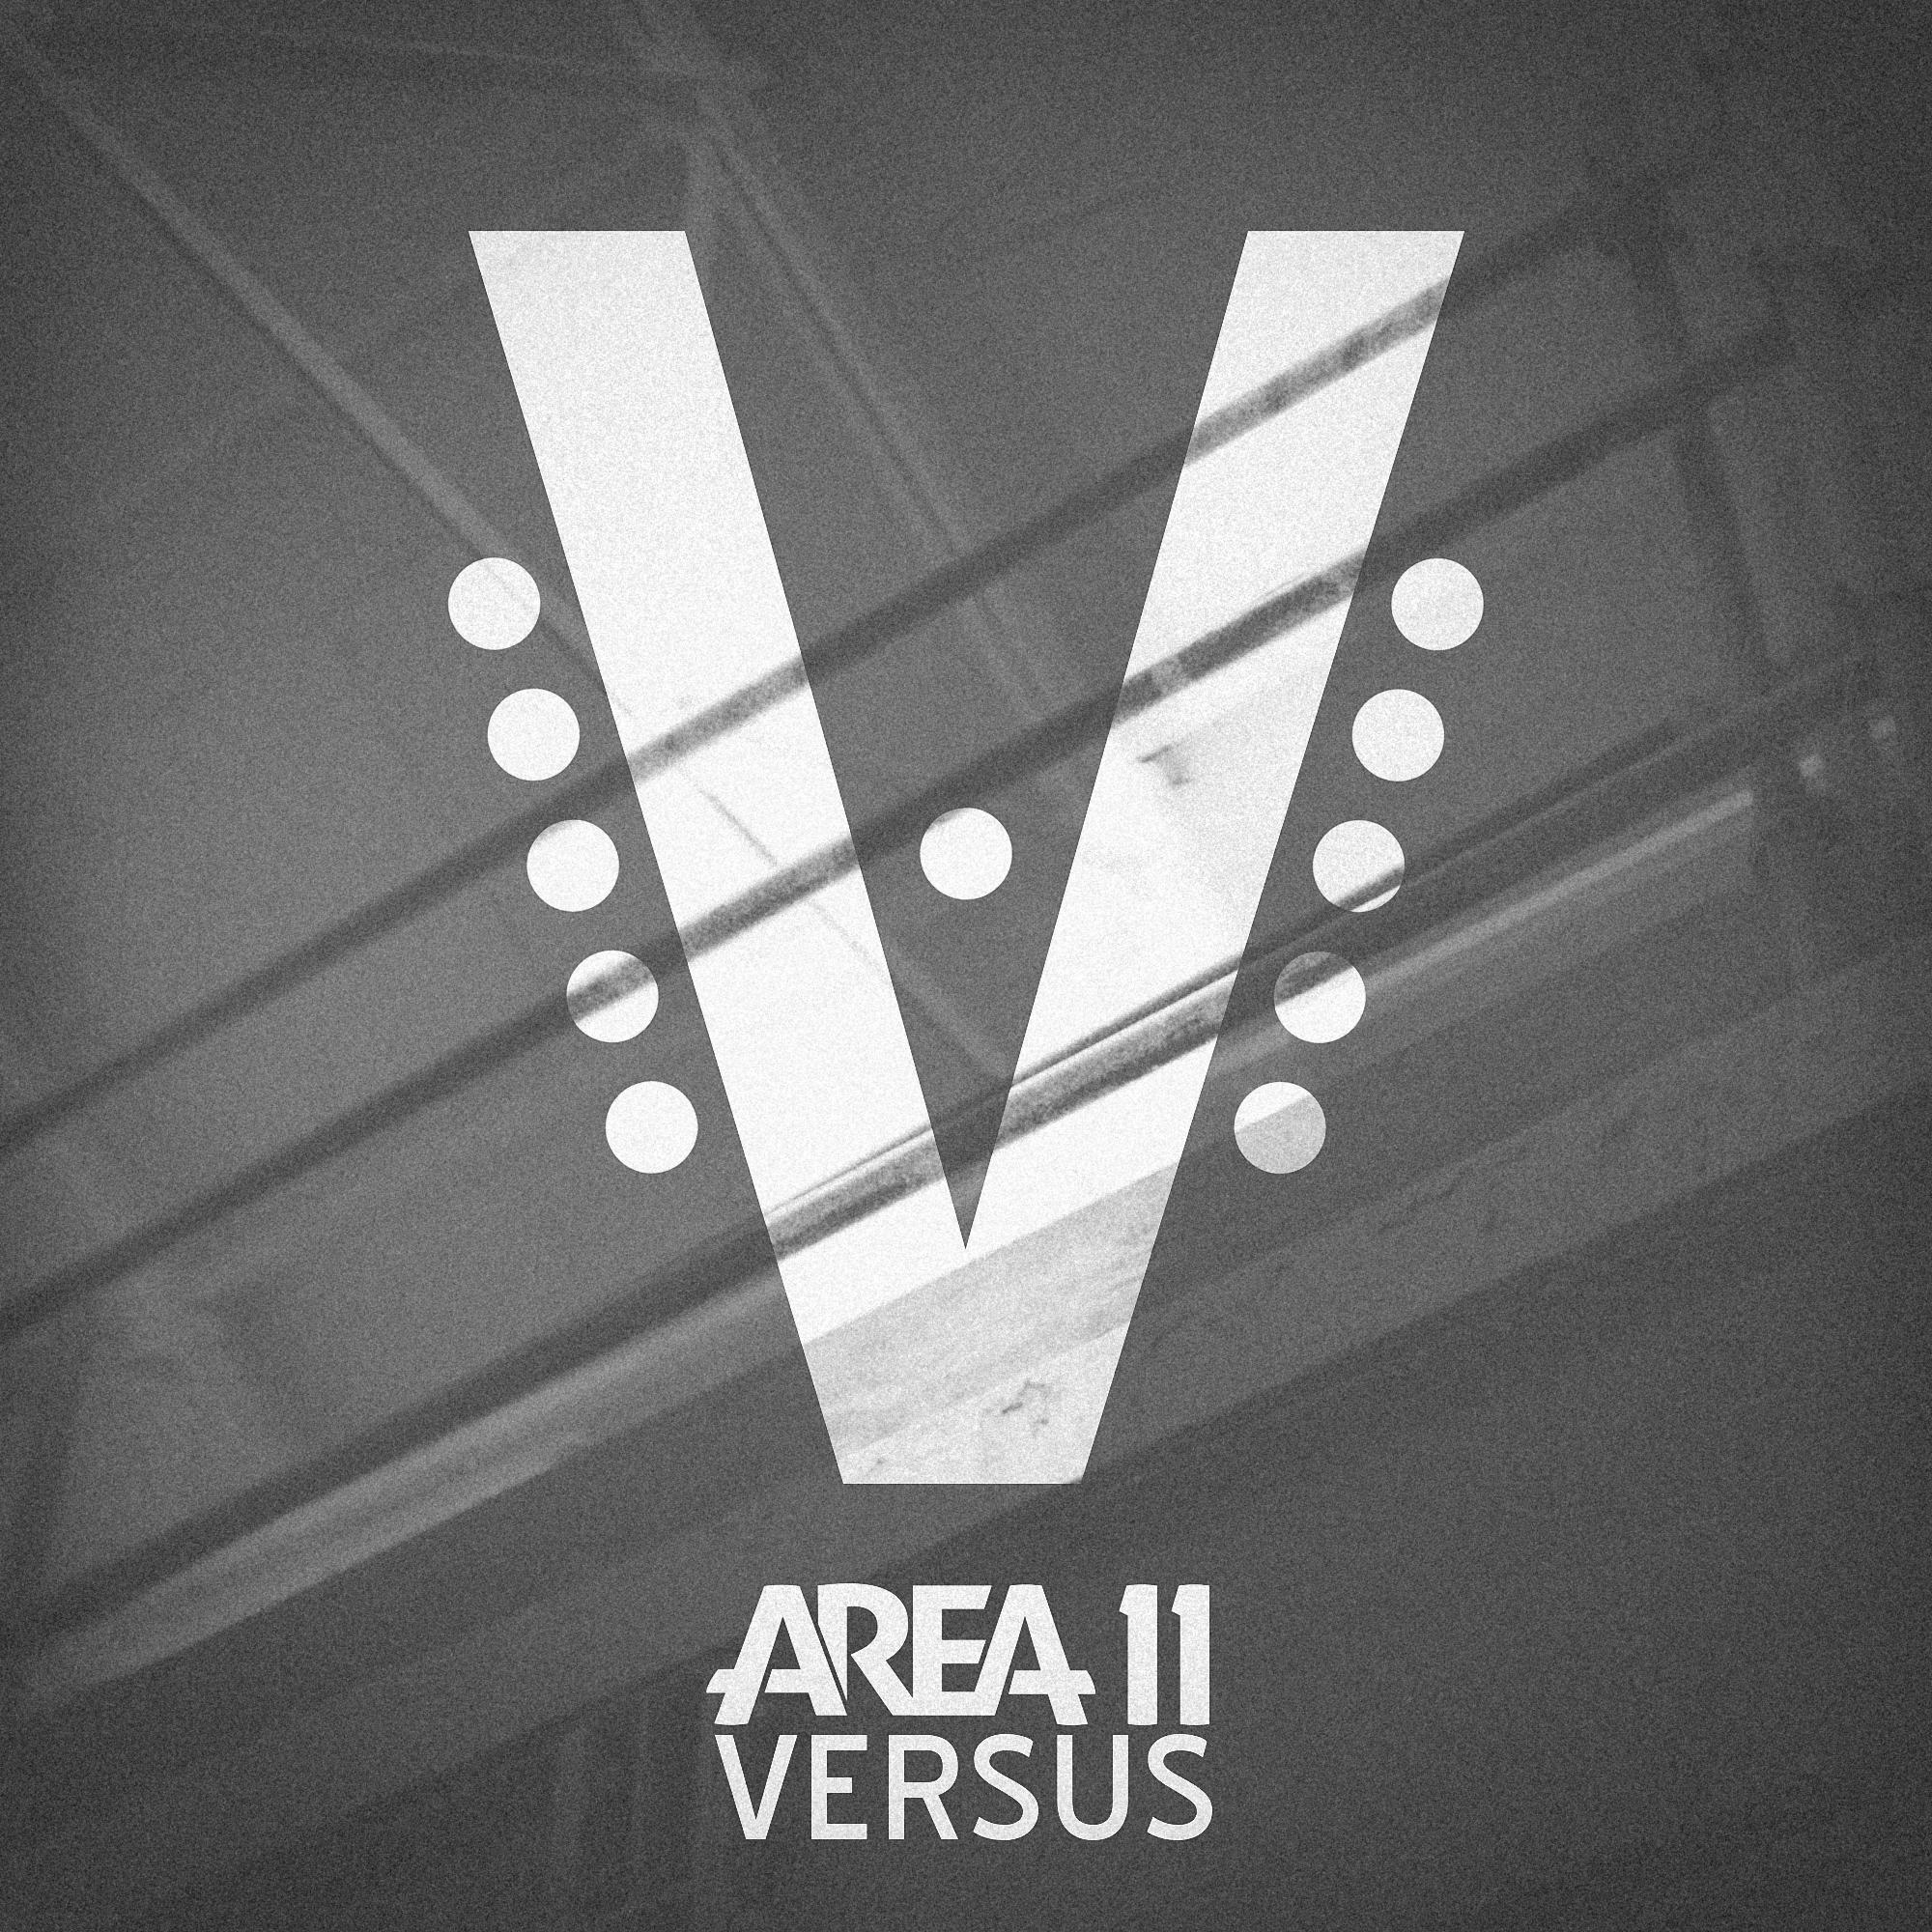 Versus - Single (MP3)